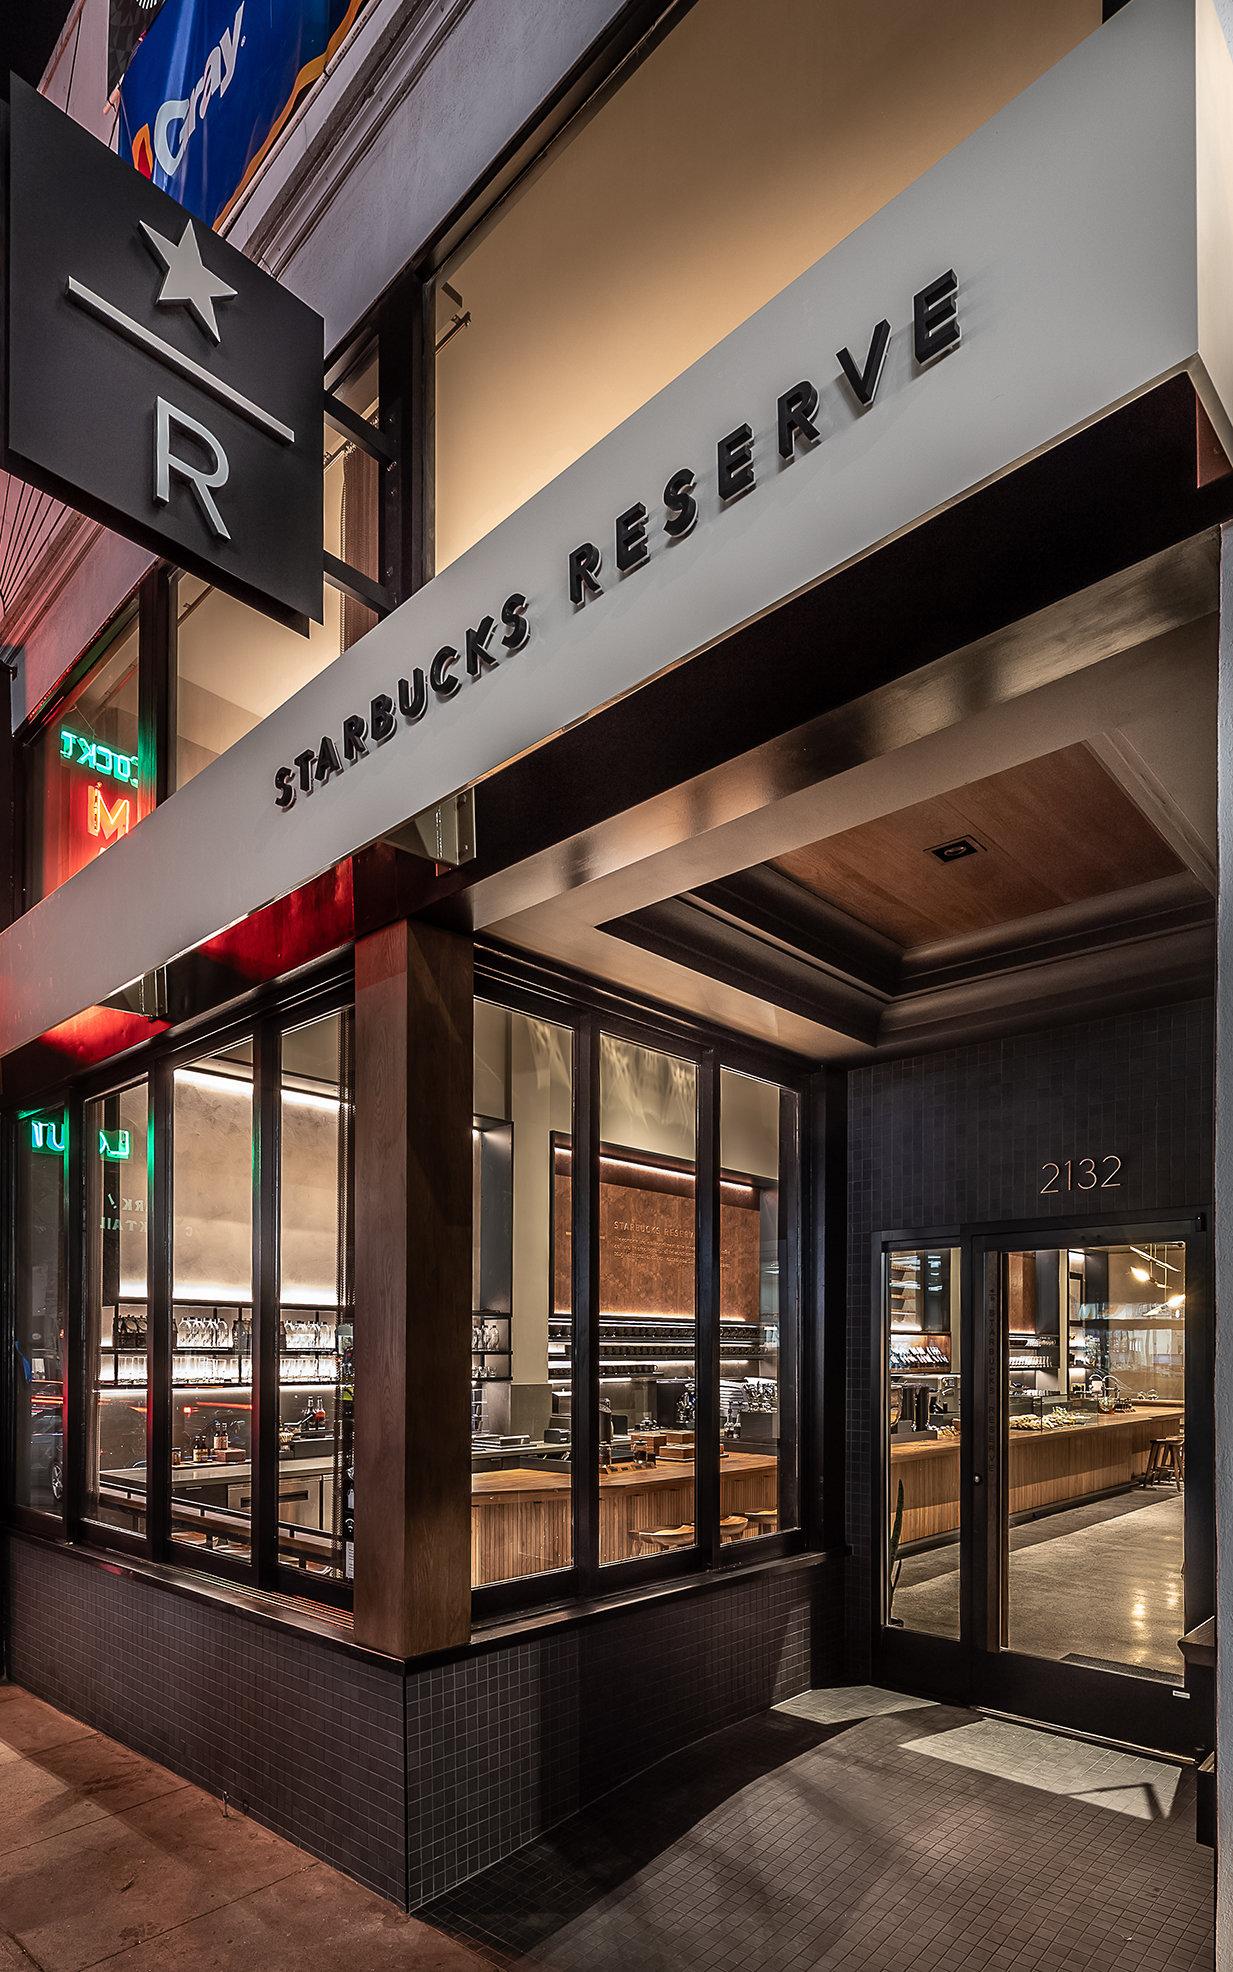 Starbucks Reserve SFO - Chestnut St (2018) by John Boline at